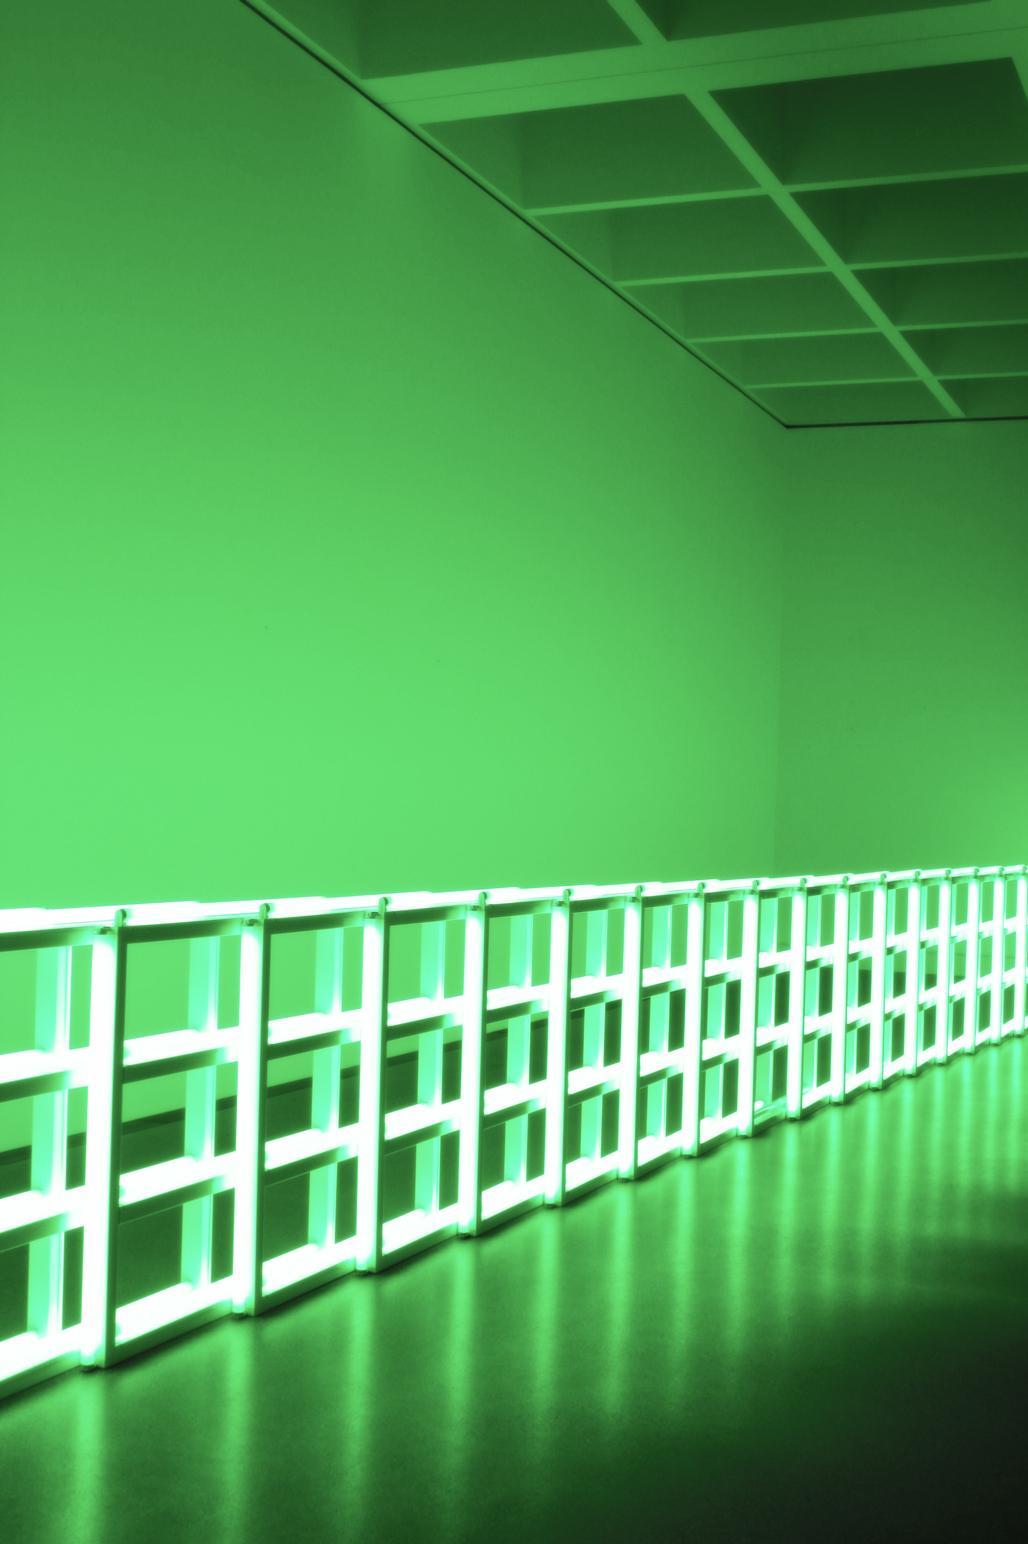 Pinakothek der Moderne Architectual Photographie on designsetter